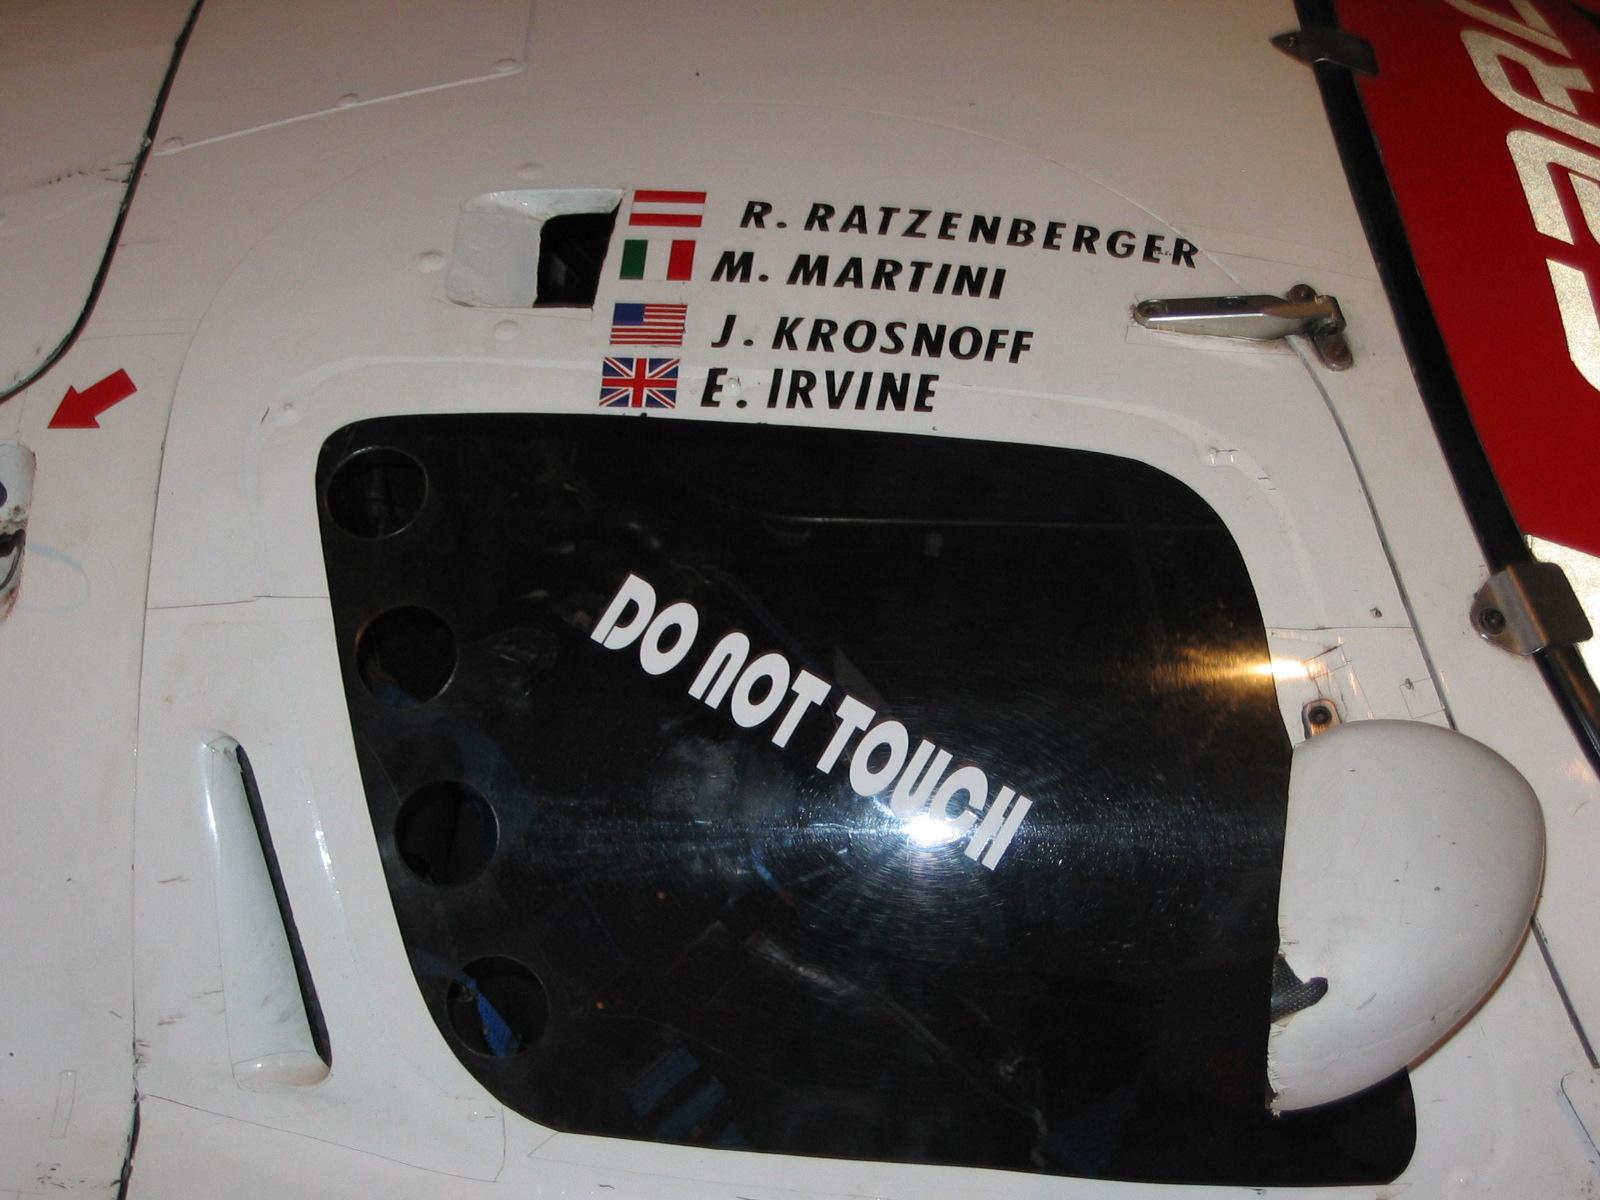 Berühmte Namen, Ratzenberger verstarb 2 Monate zuvor, Krosnoff 2 Jahre danach bei Rennen